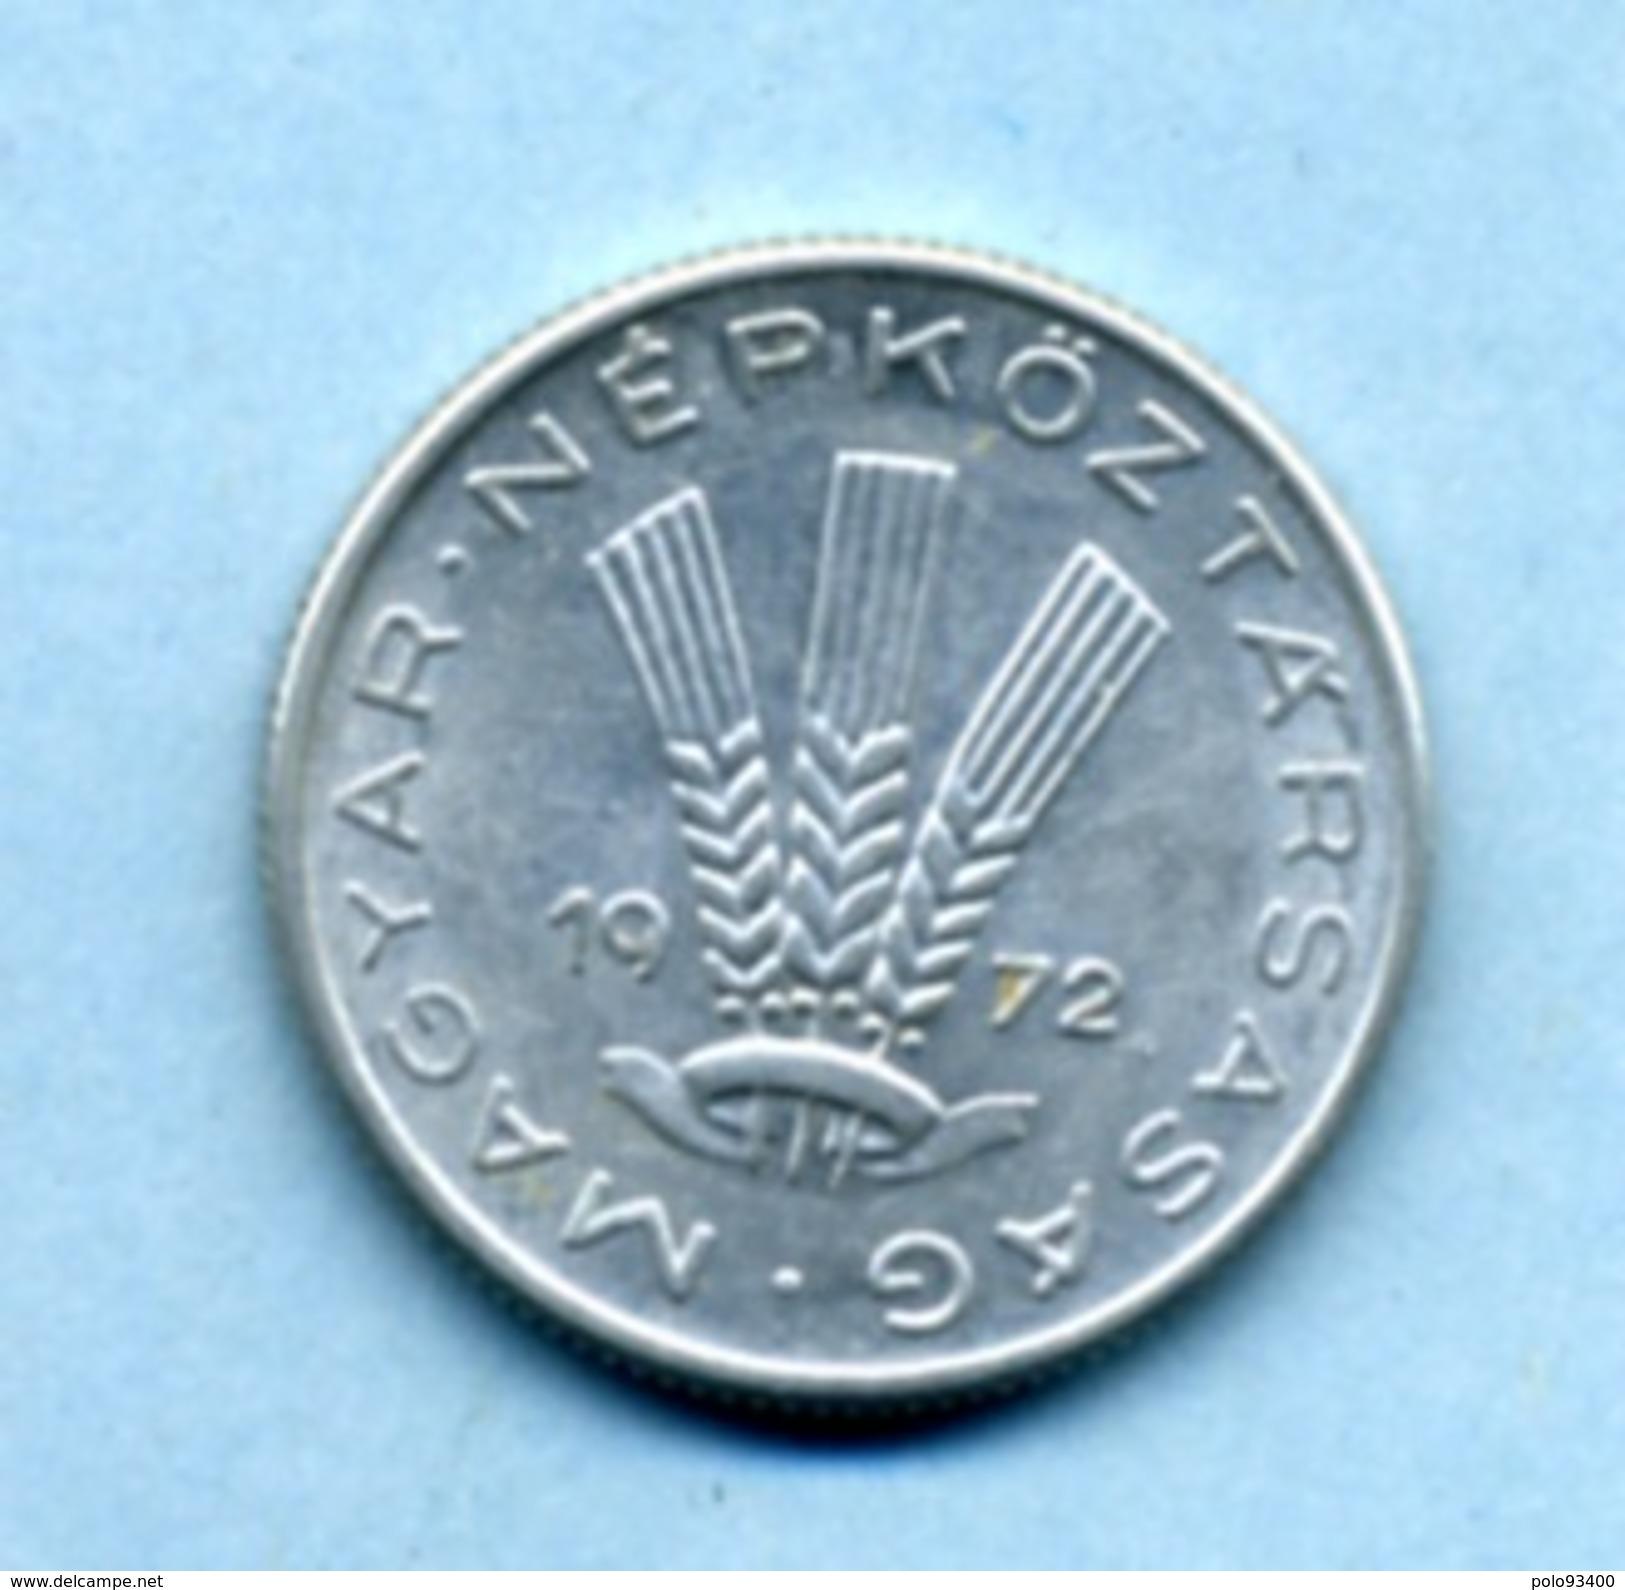 1972 20 FILLER - Hungary